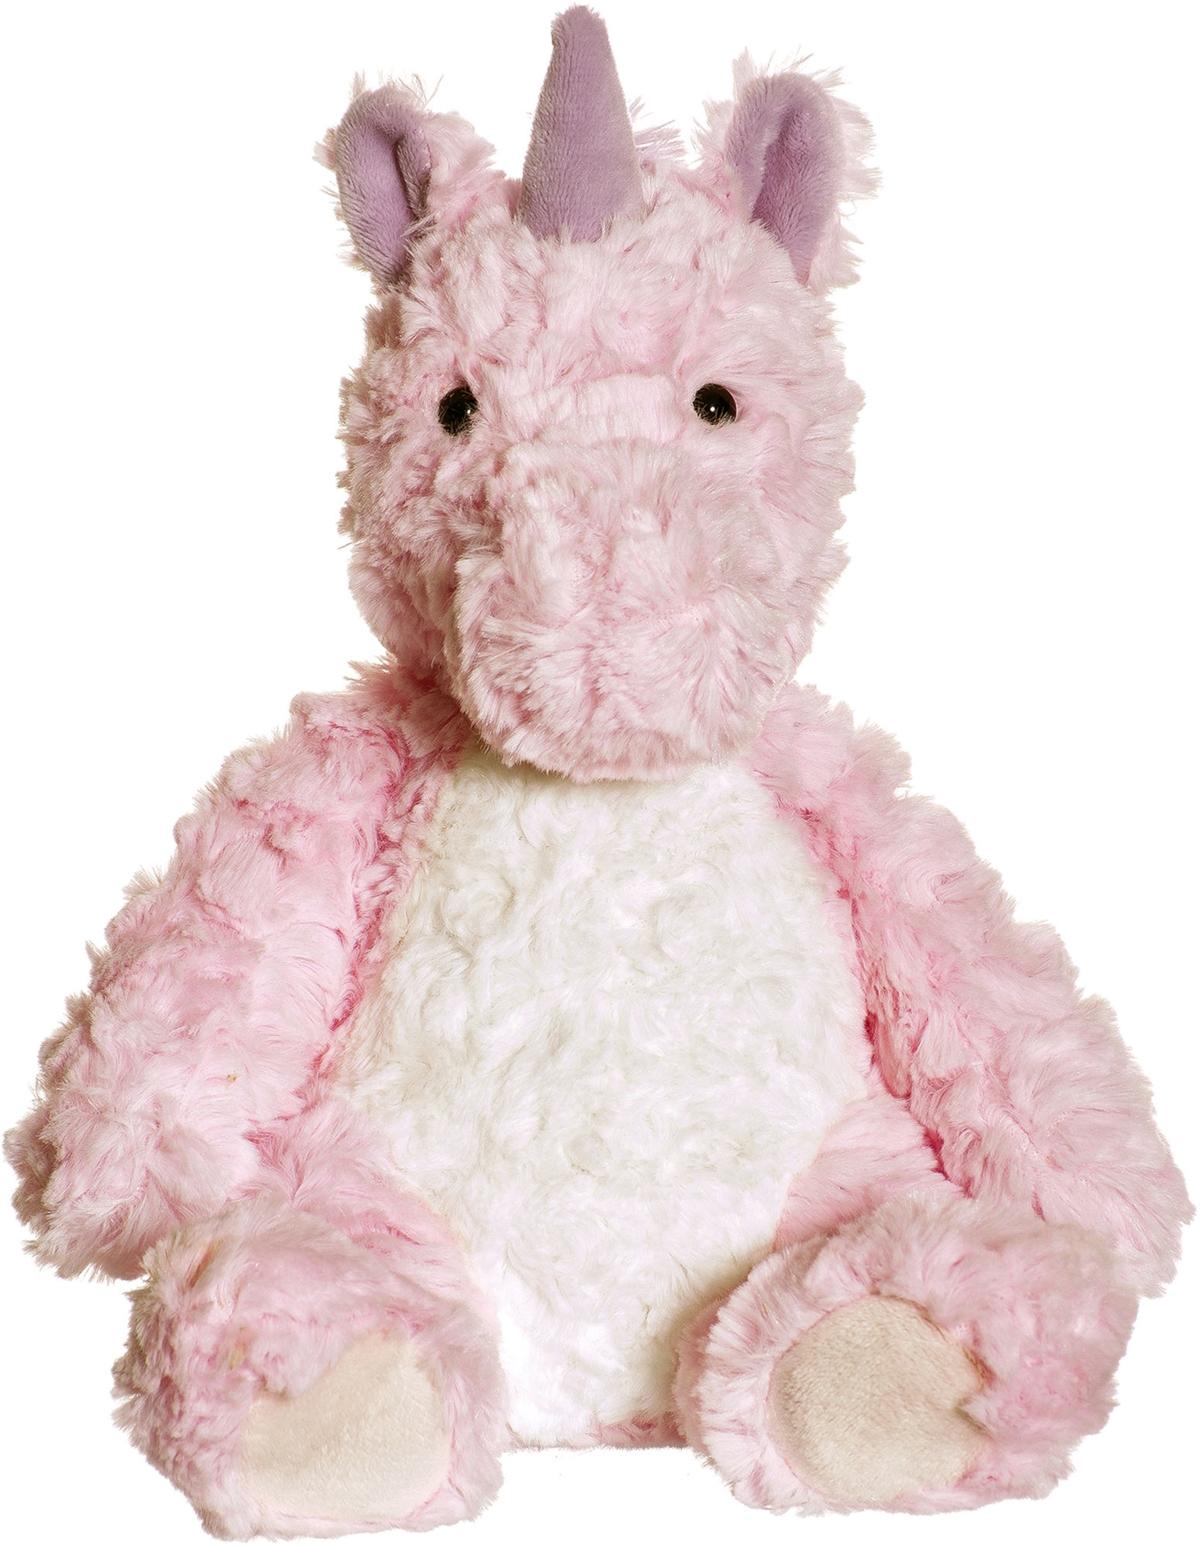 Softies Enhörningen Estelle, 28cm - Teddykompaniet